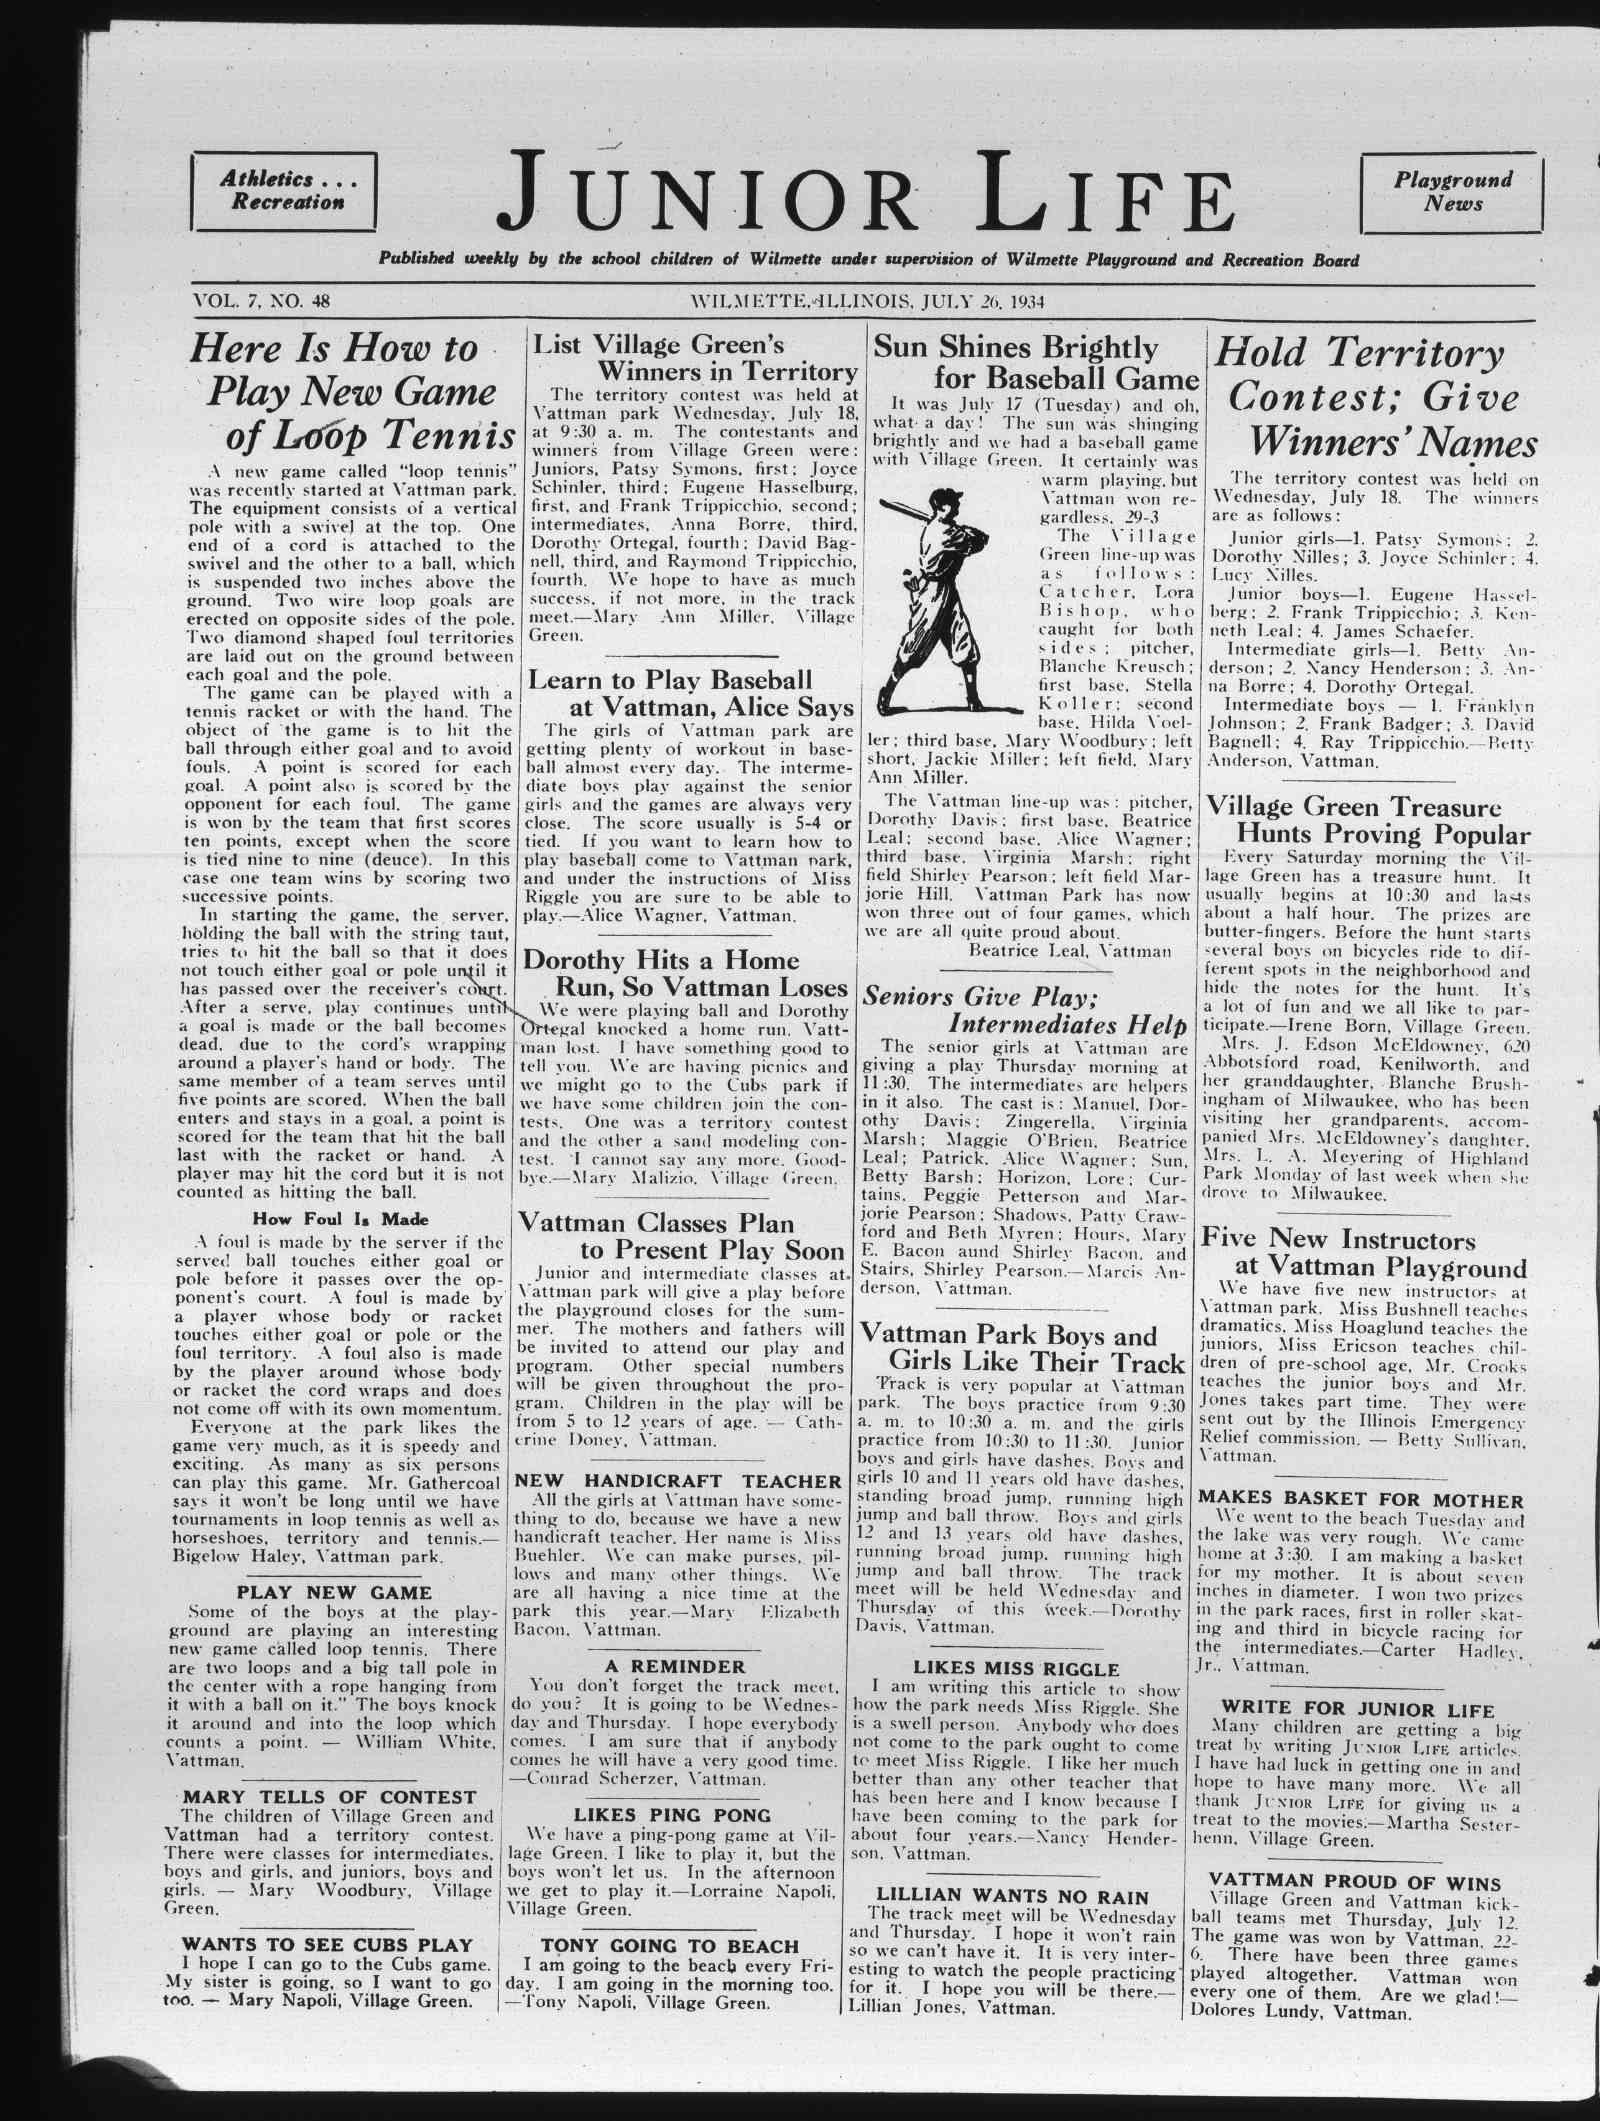 Wilmette Life (Wilmette, Illinois), 26 Jul 1934